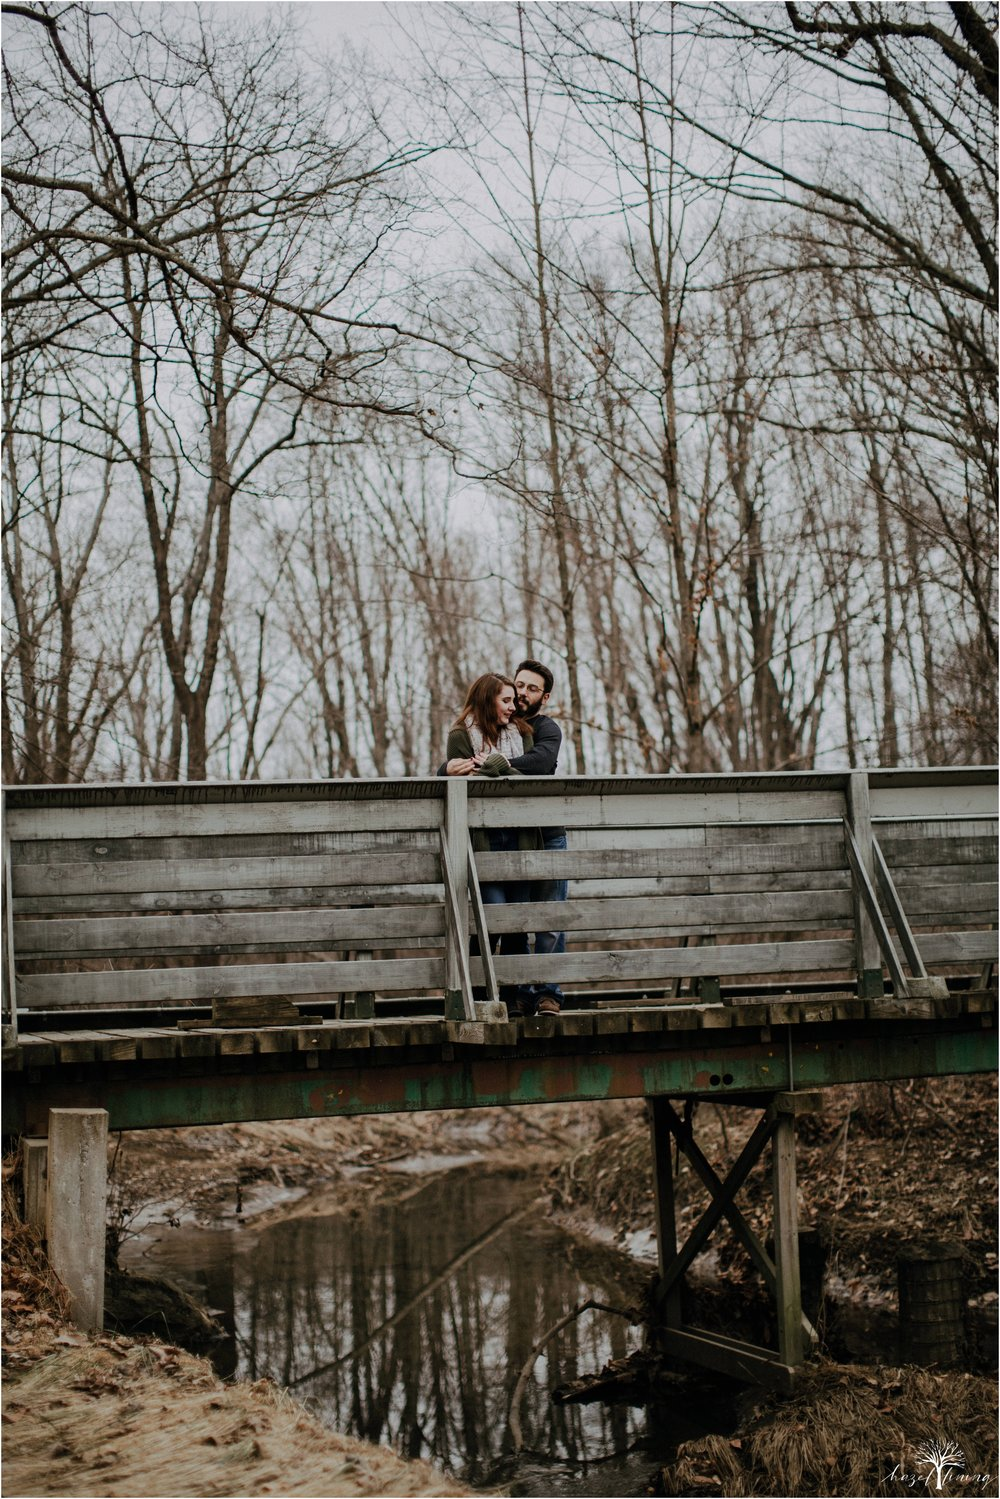 evan-maggie-lesh-one-year-anniversary-winter-shoot-camp-menolan-pennsylvania_0038.jpg